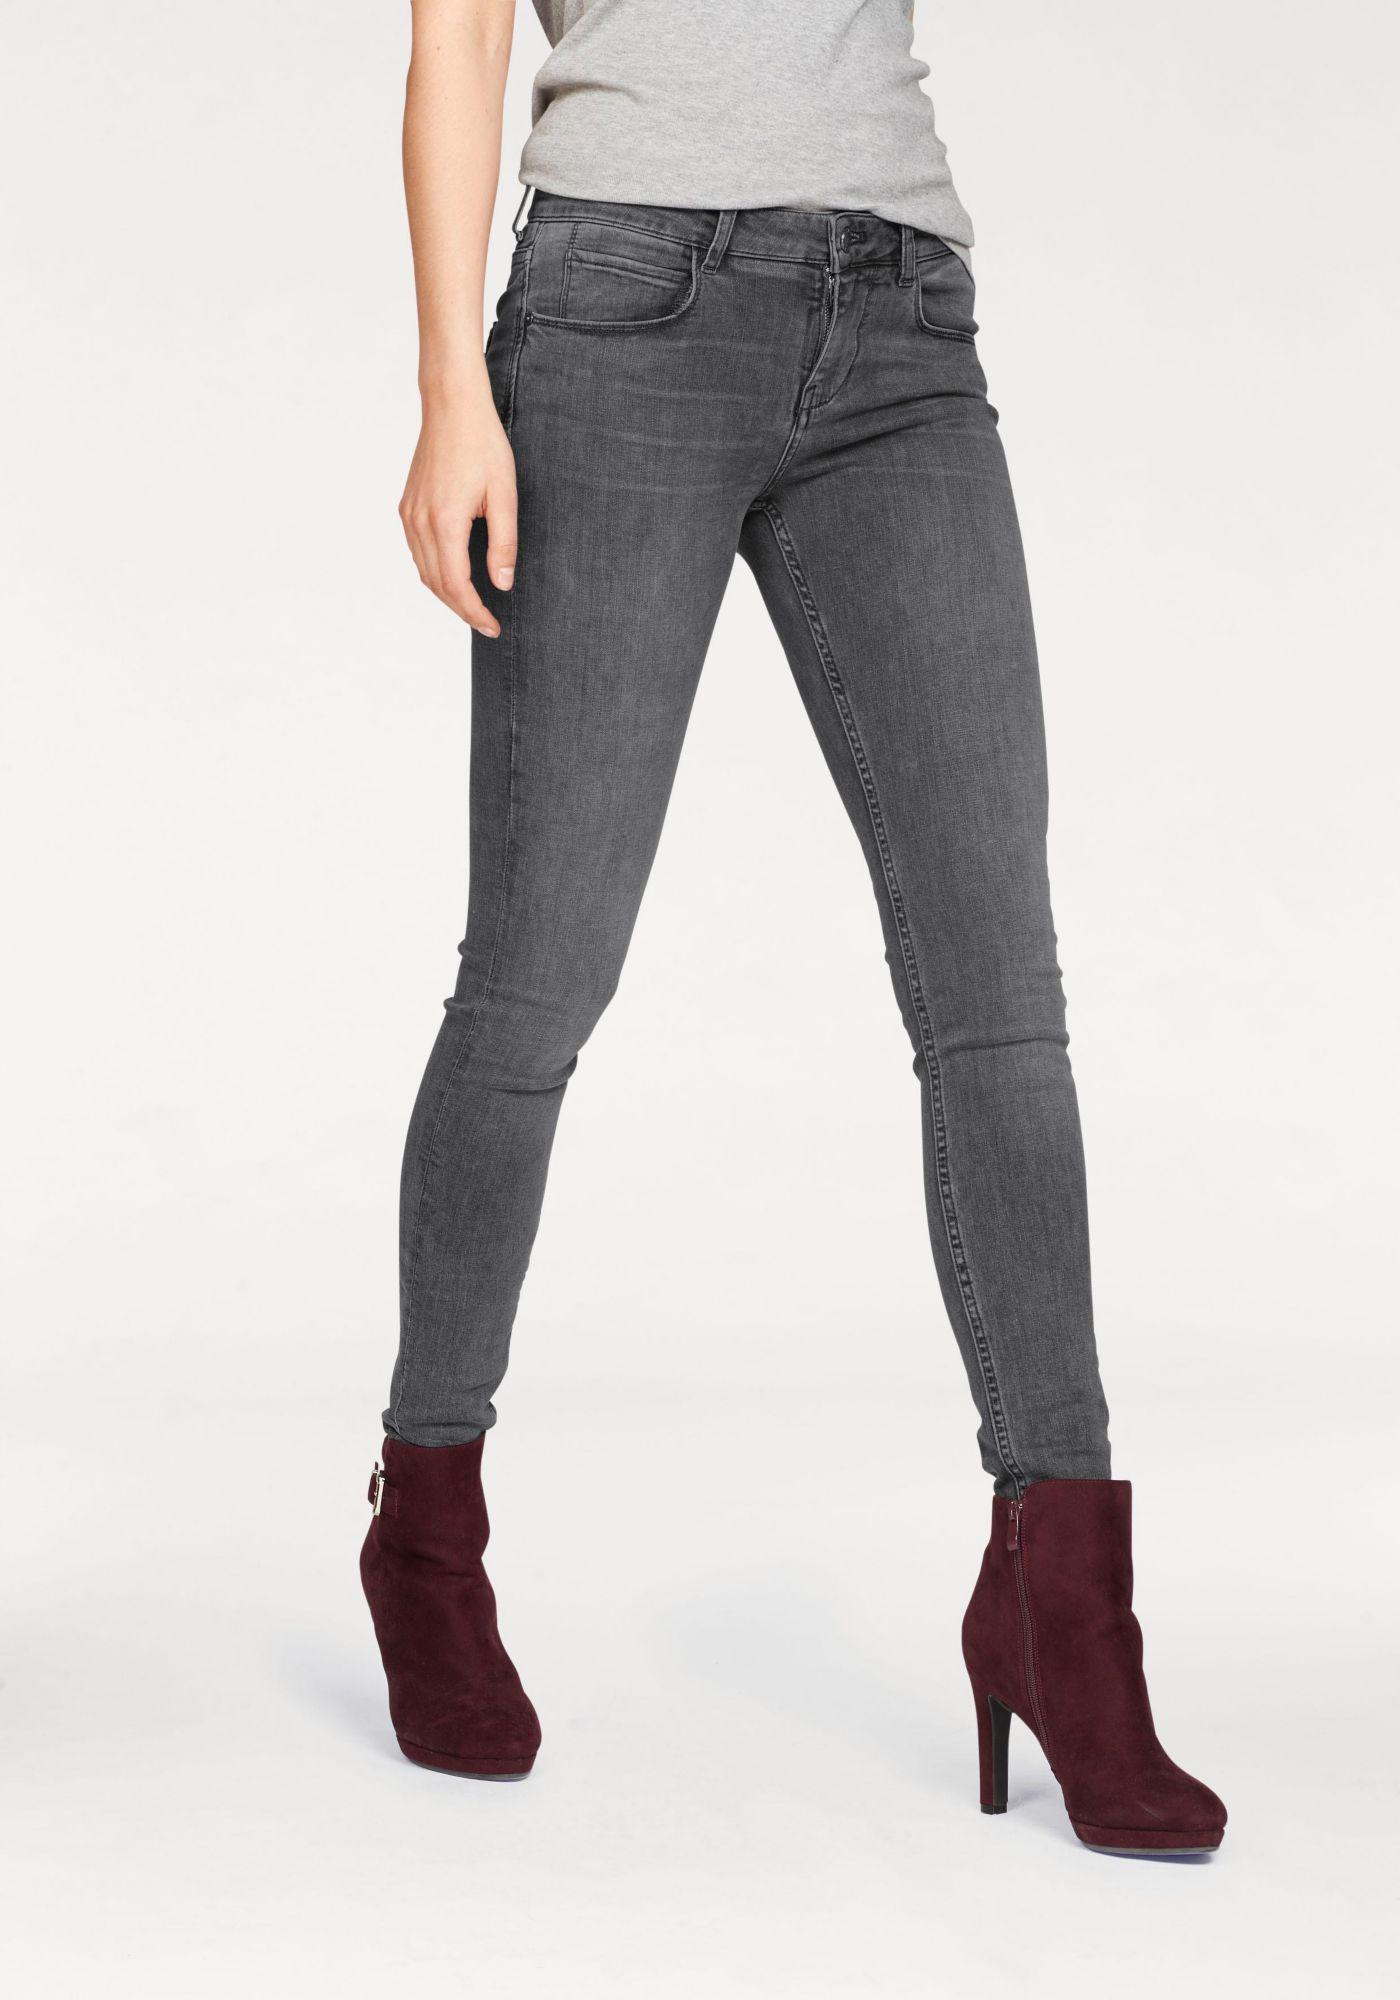 FRITZI AUS PREUßEN Fritzi aus Preußen Skinny-fit-Jeans »DOWNEY SKINNY BASIC«